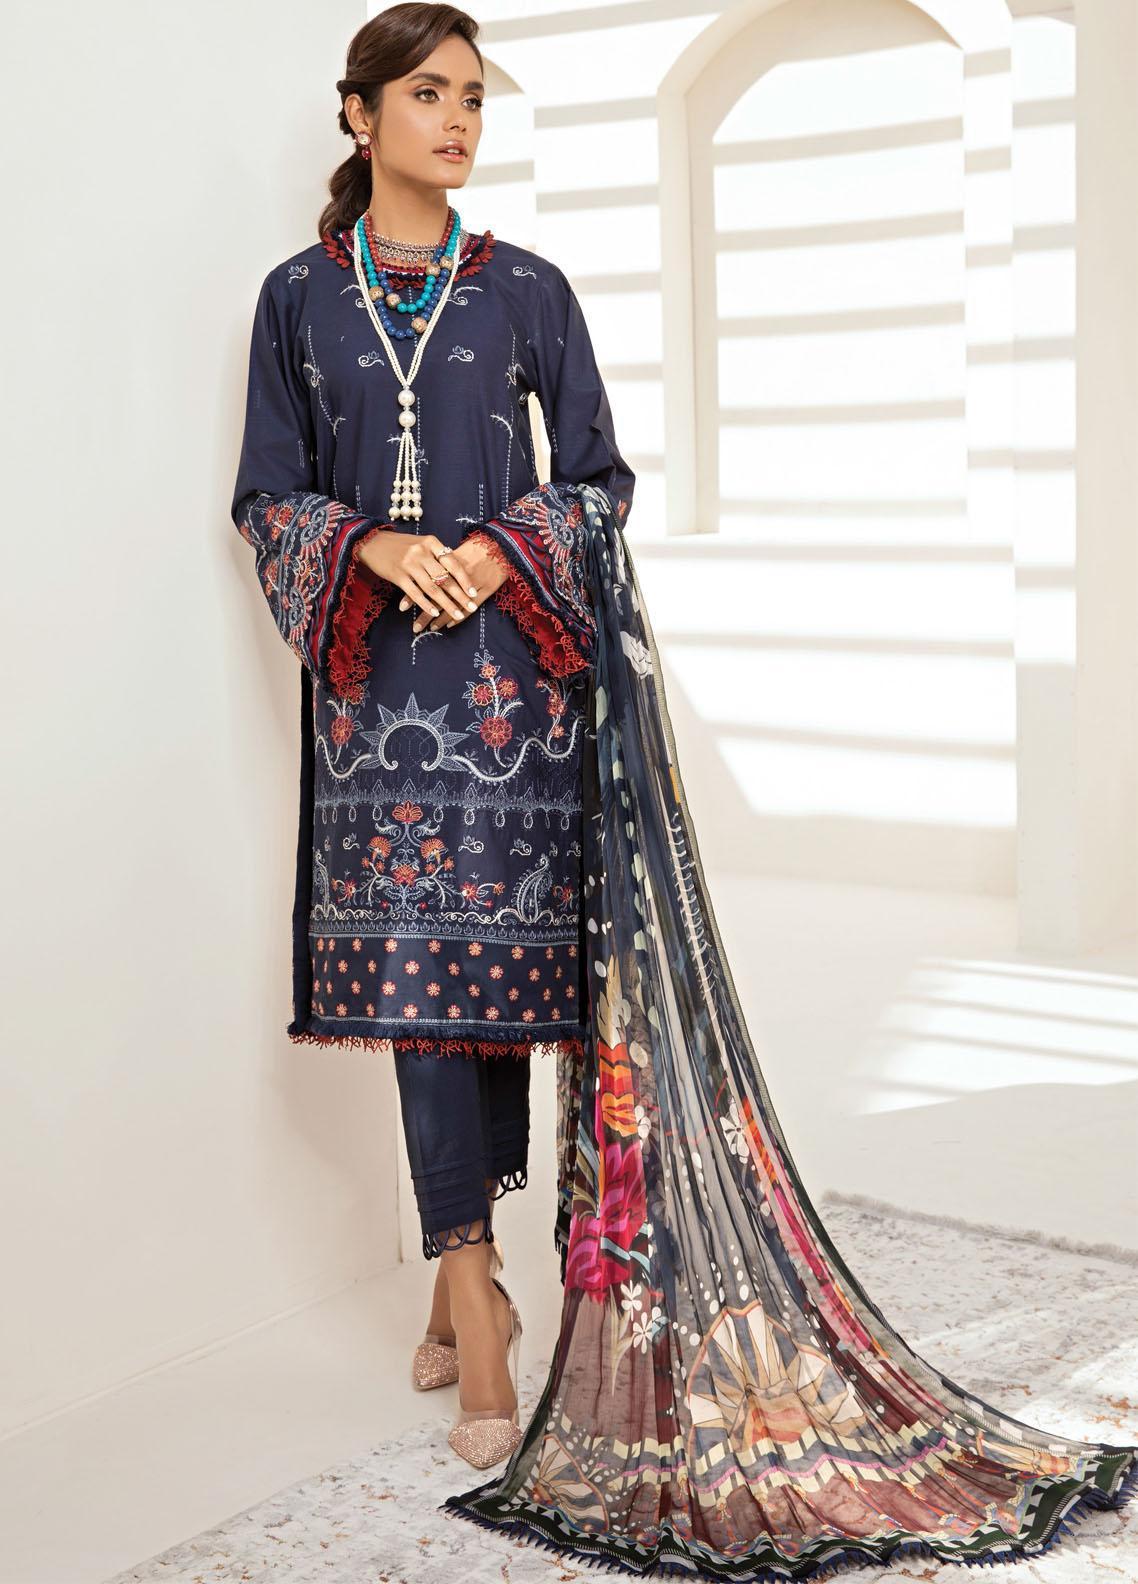 Farasha Embroidered Lawn Suits Unstitched 3 Piece FSH21-L2 01 Navy Romance - Festive Collection